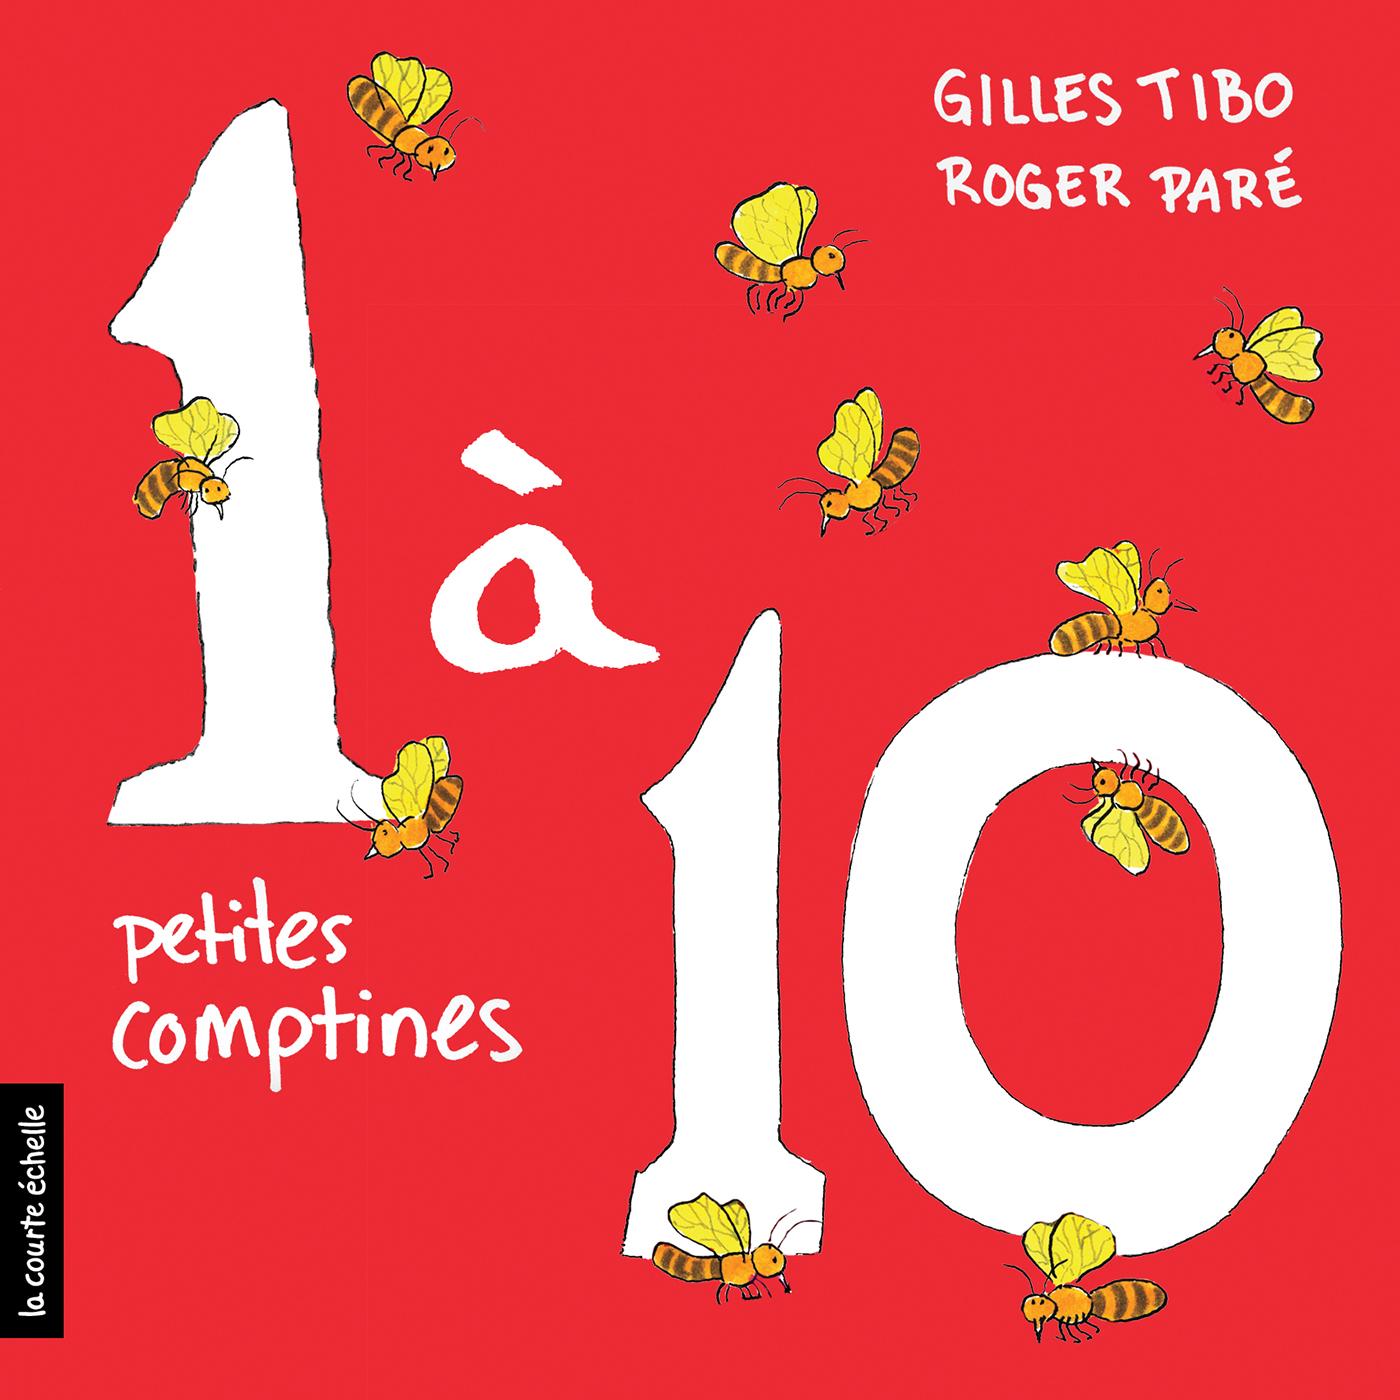 1 à 10 : petites comptines